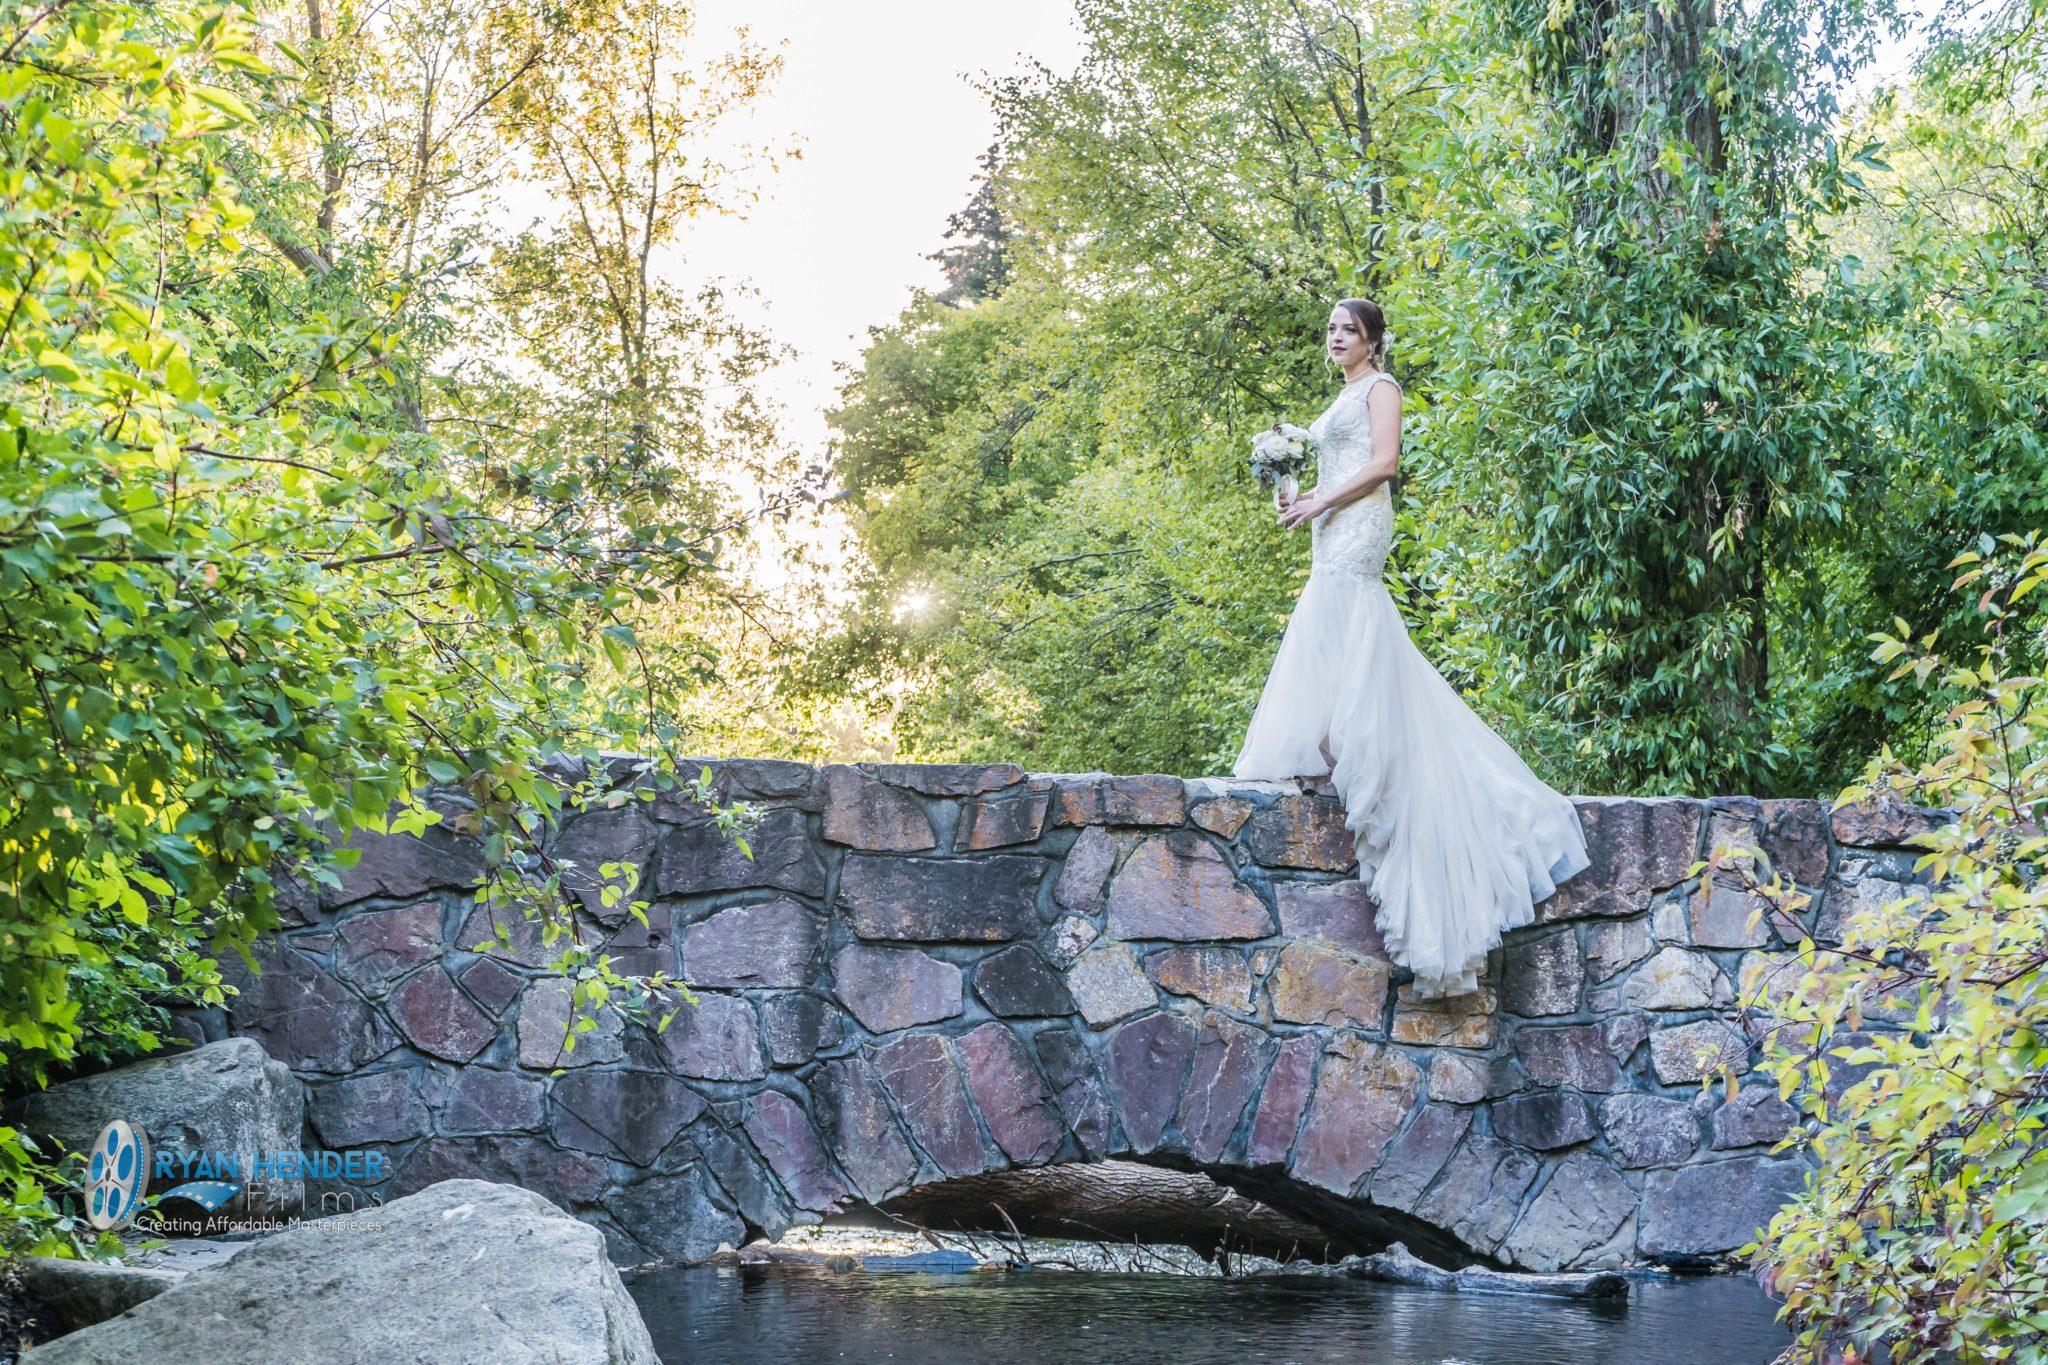 bride waiting on bridge for groom